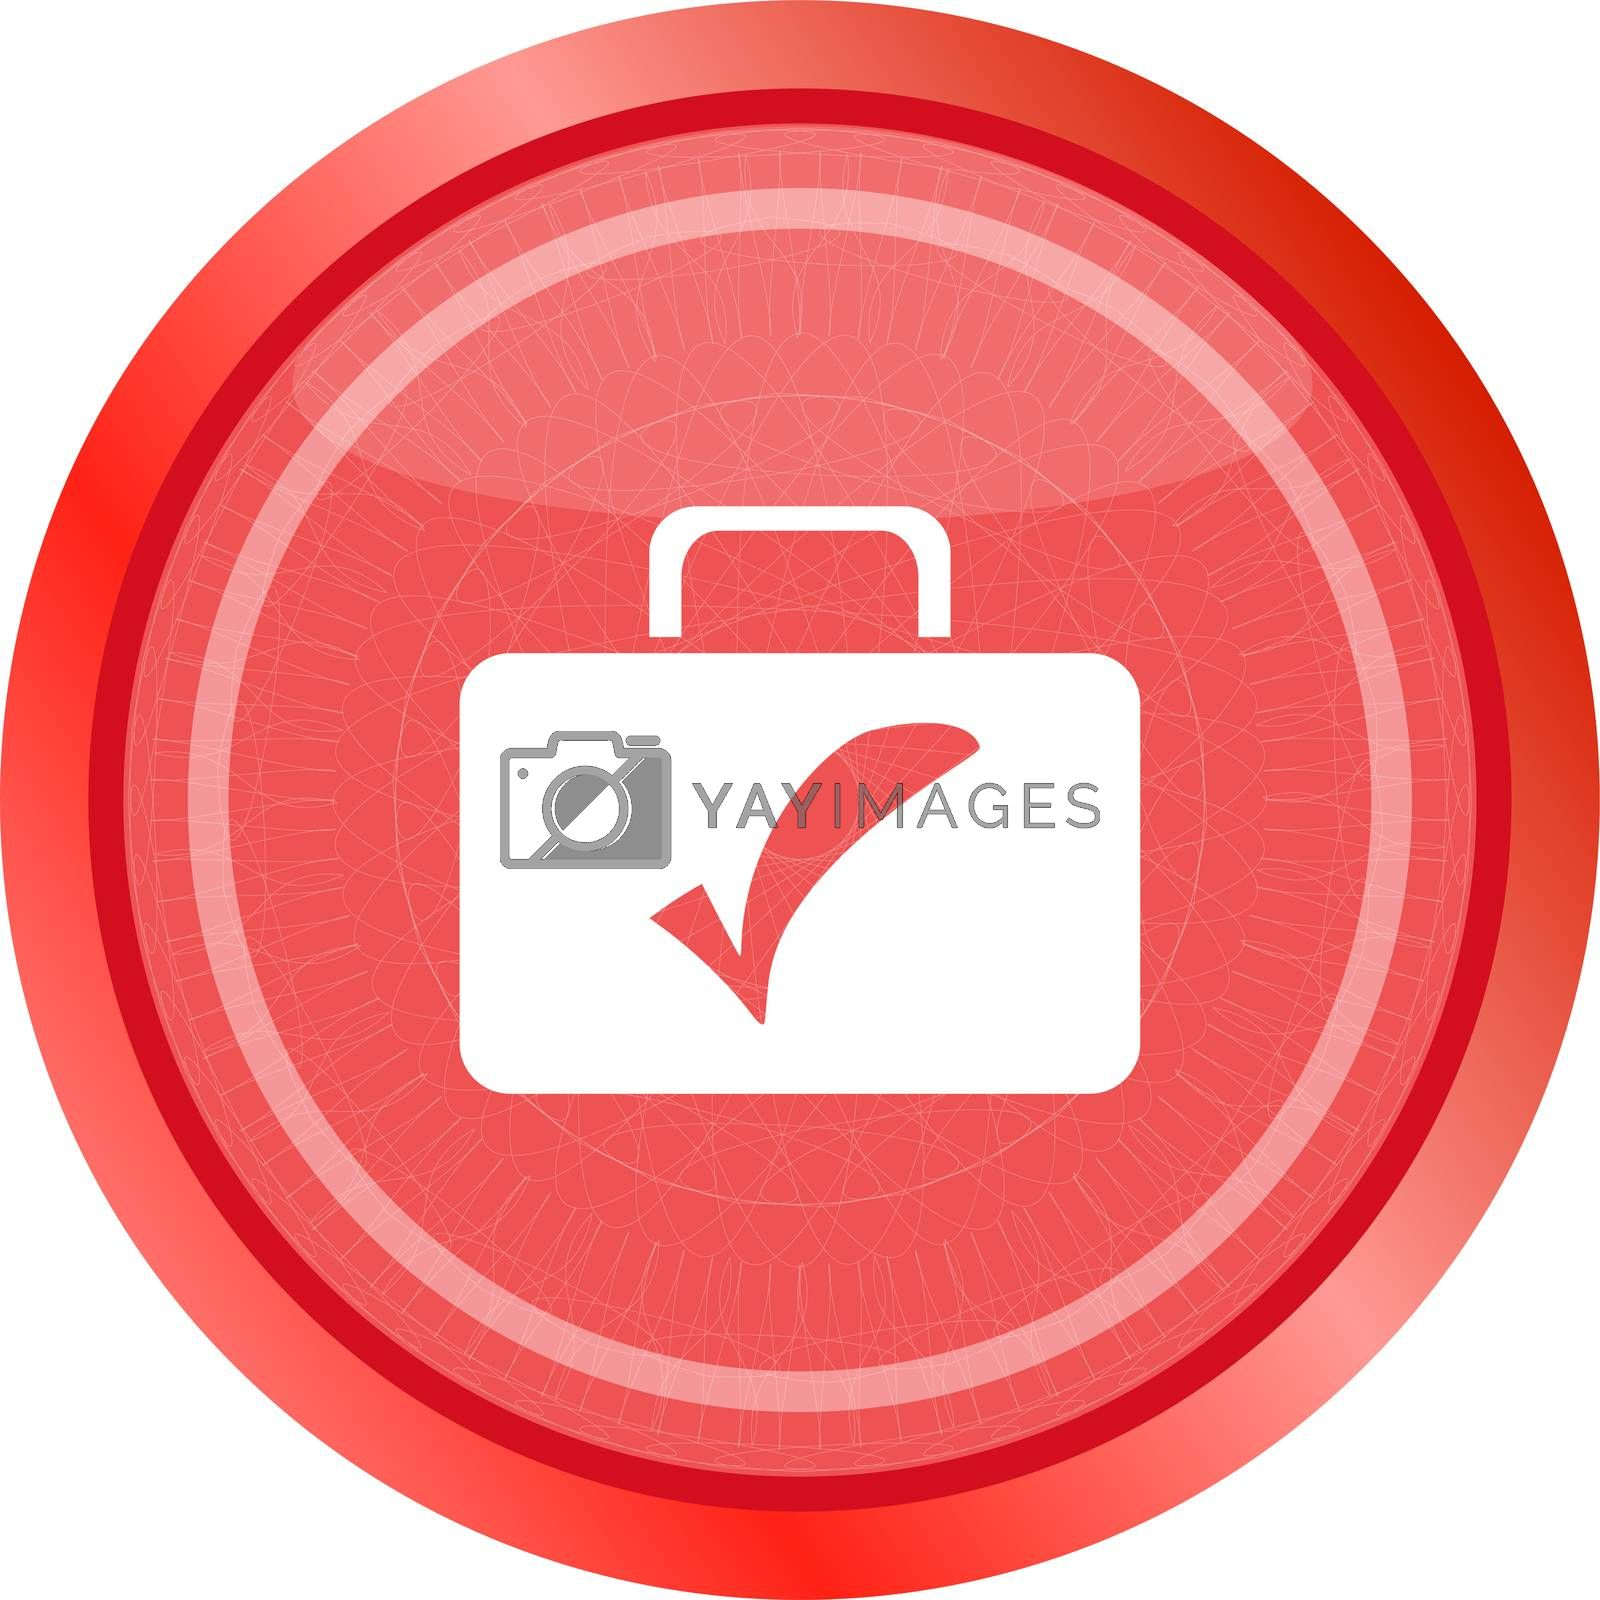 tick mark on business suitcase. web icon isolated on white background